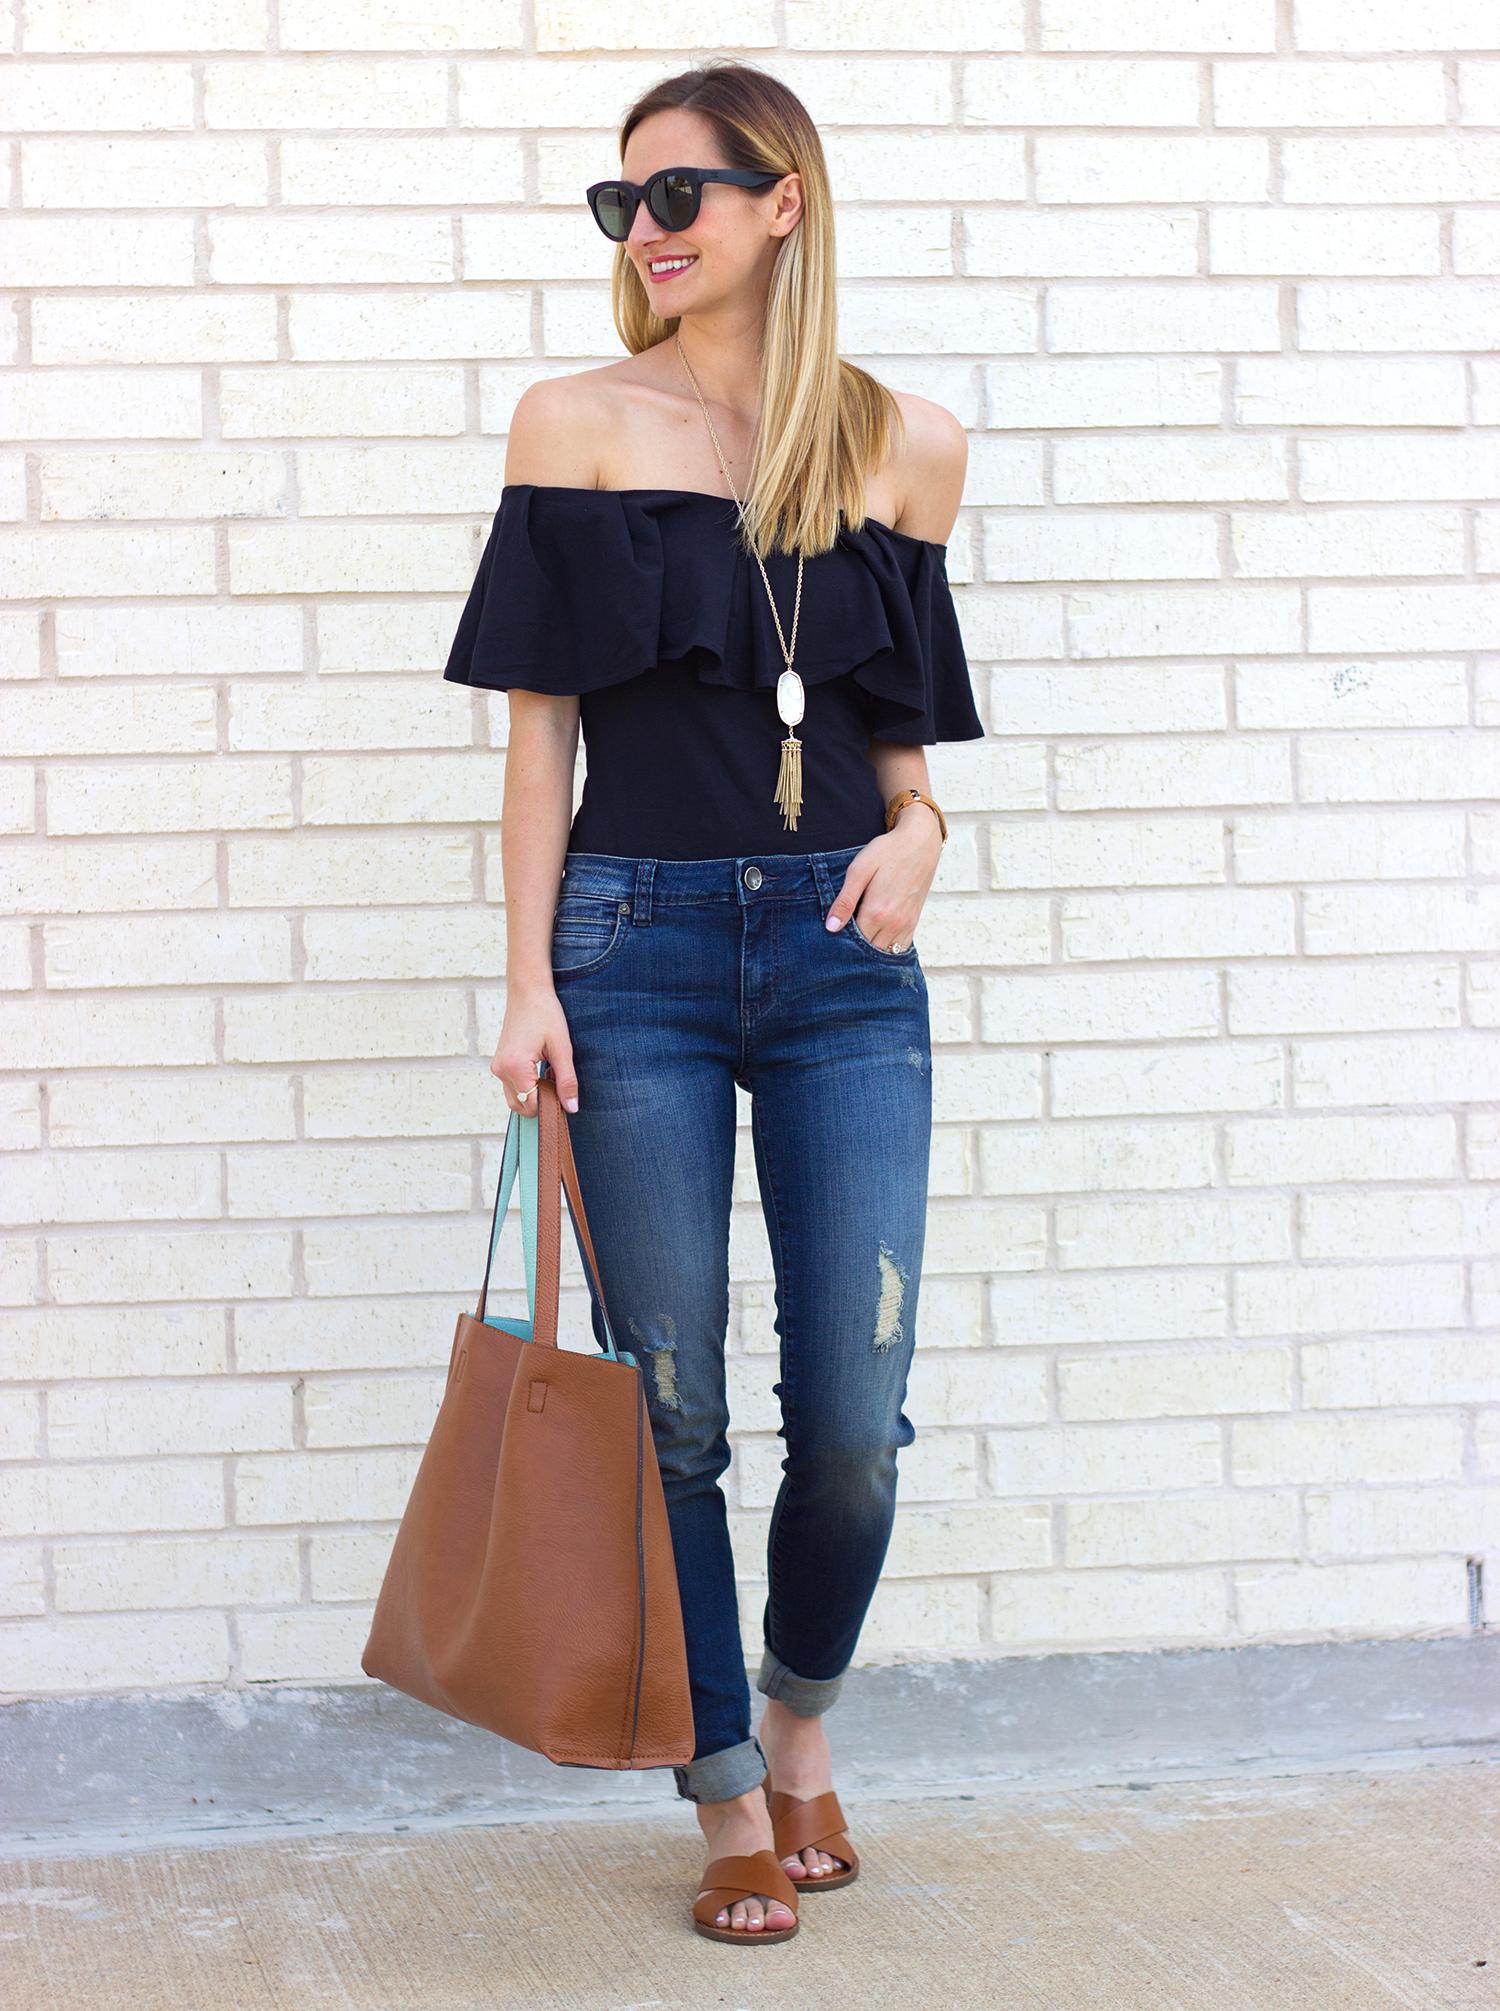 1954ea20946220 livvyland-blog-olivia-watson-austin-texas-fashion-blogger-